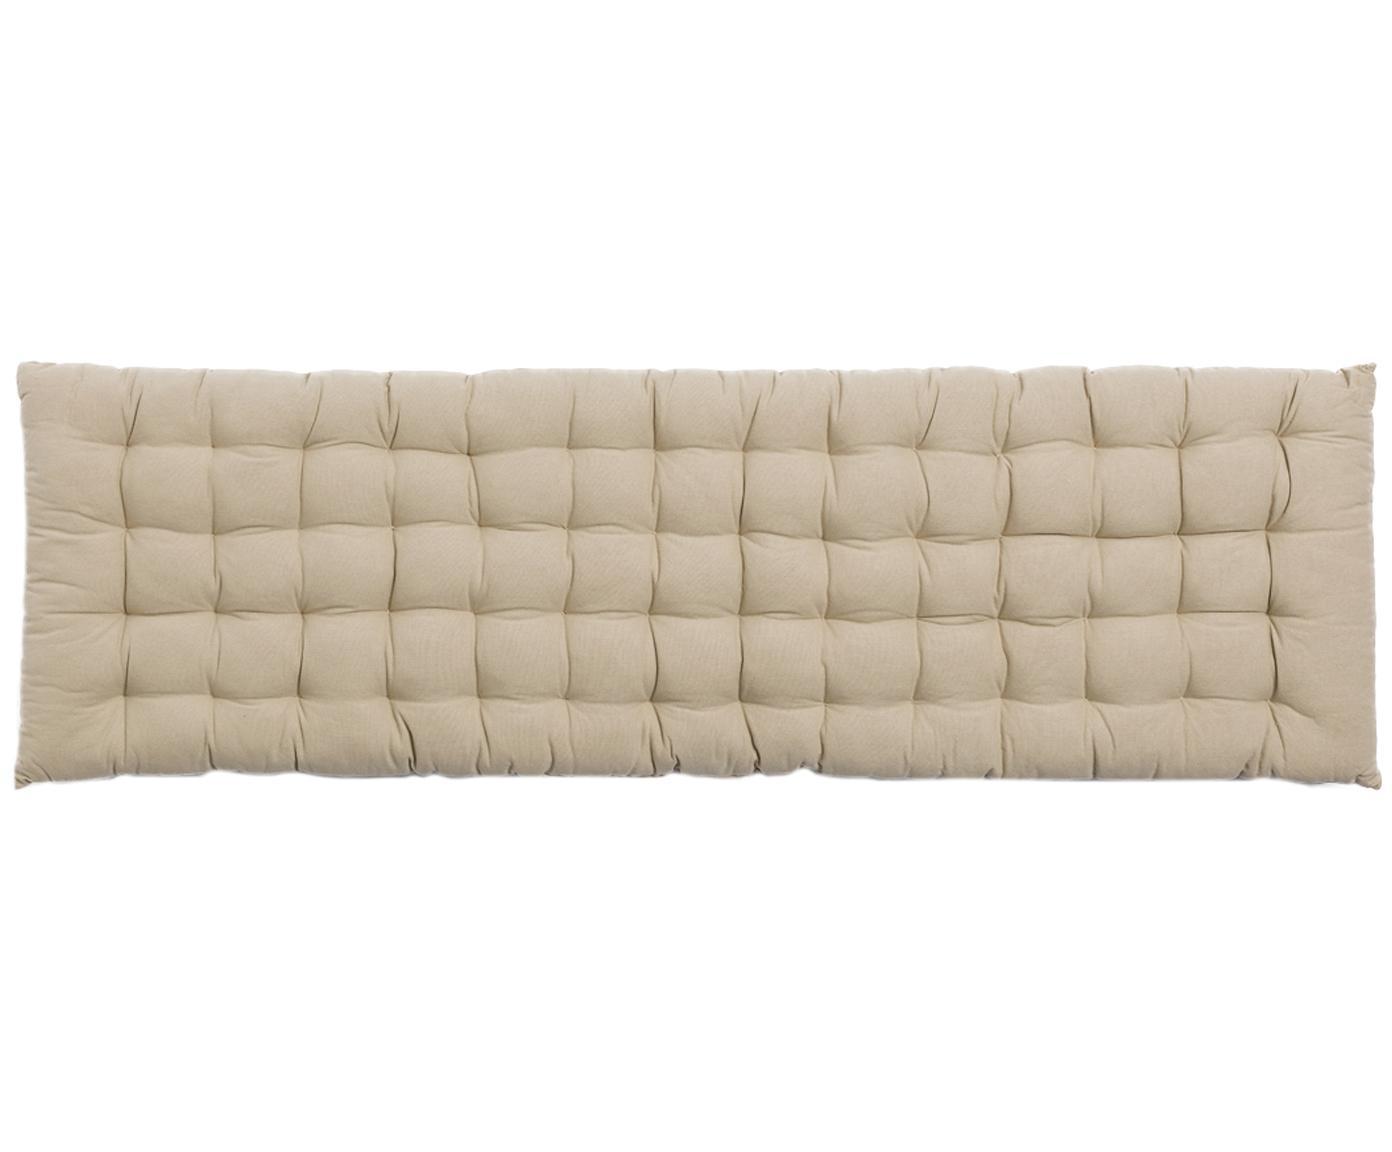 Cuscino sedia lungo Gavema, Beige, Larg. 40 x Lung. 113 cm